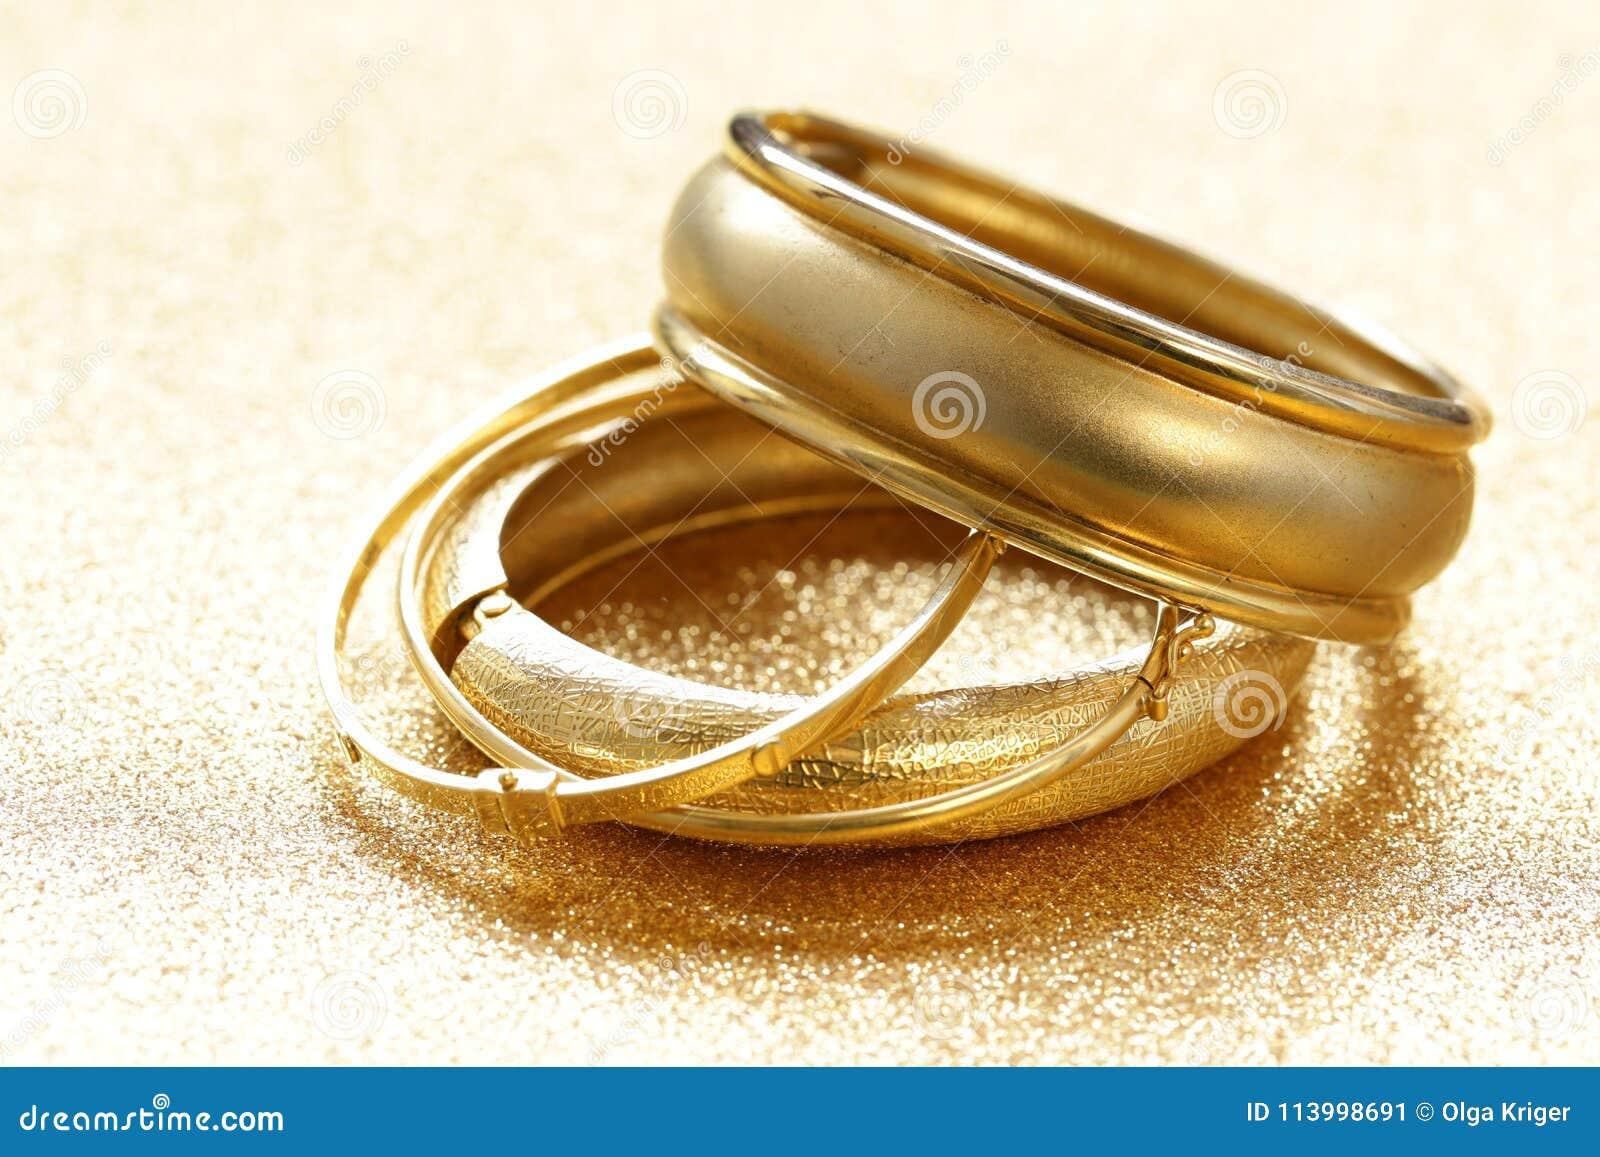 Gold jewelry bracelets